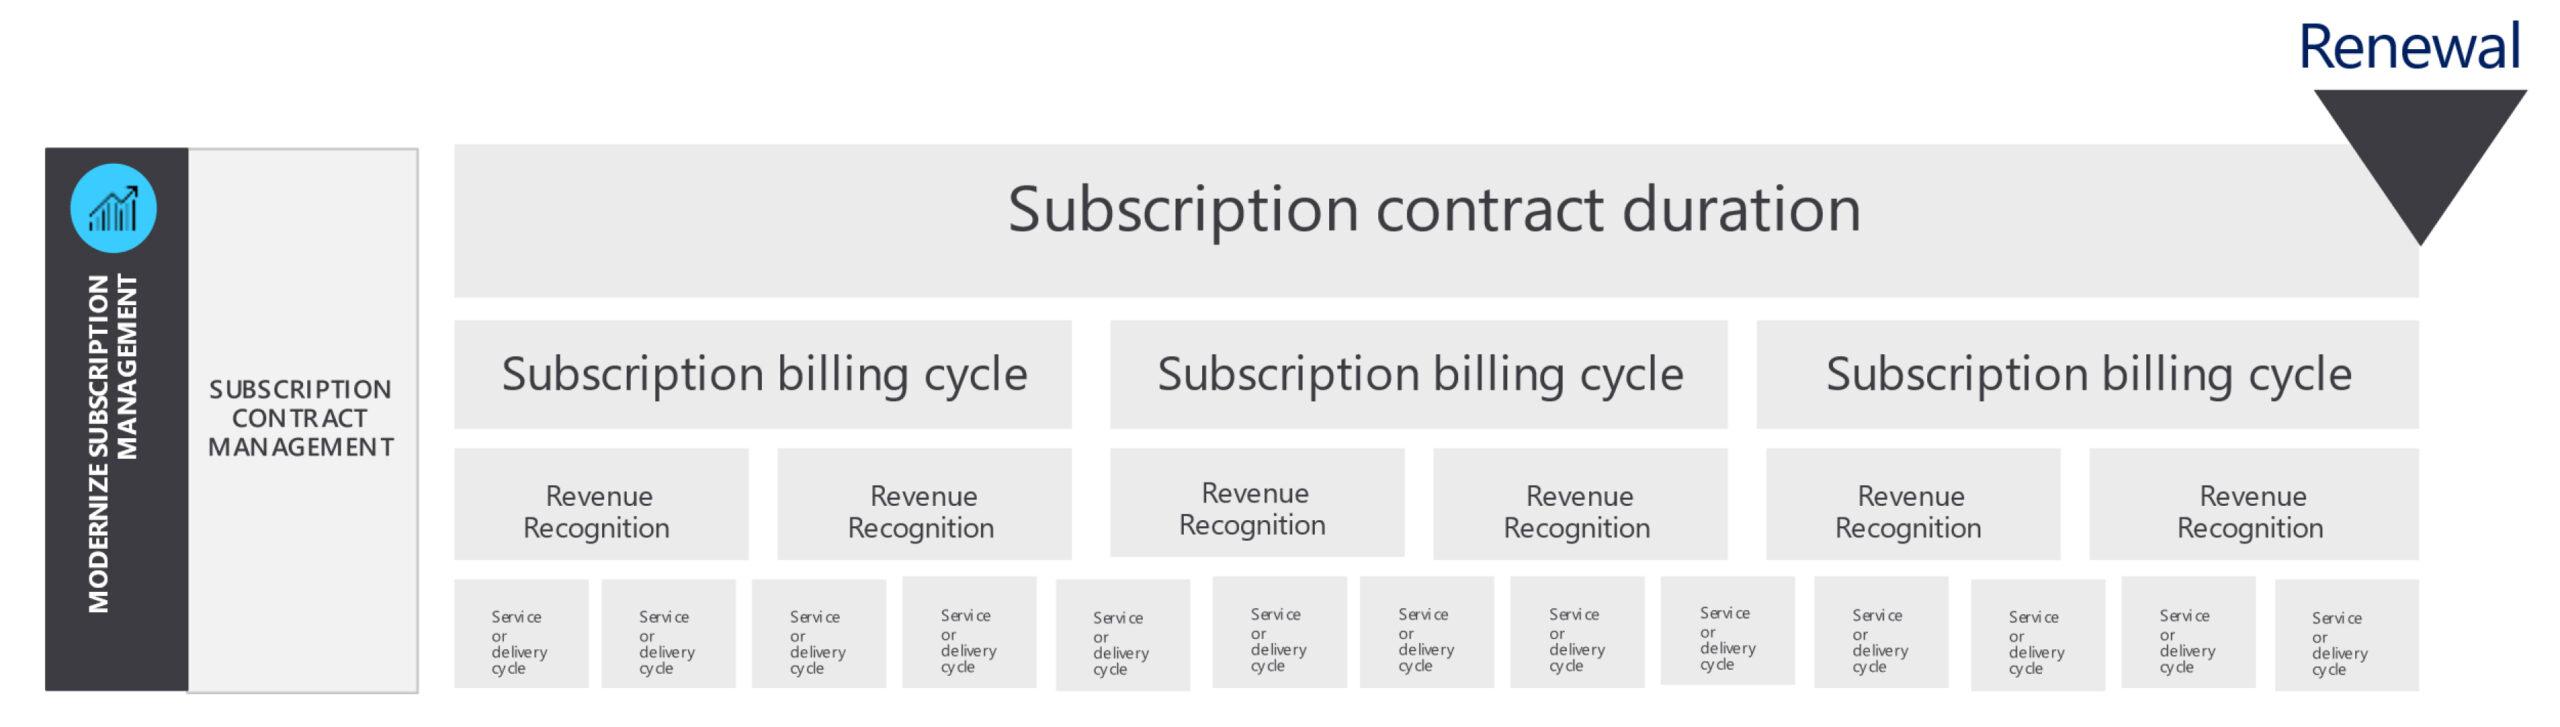 bluefort-subscription-management-cycle